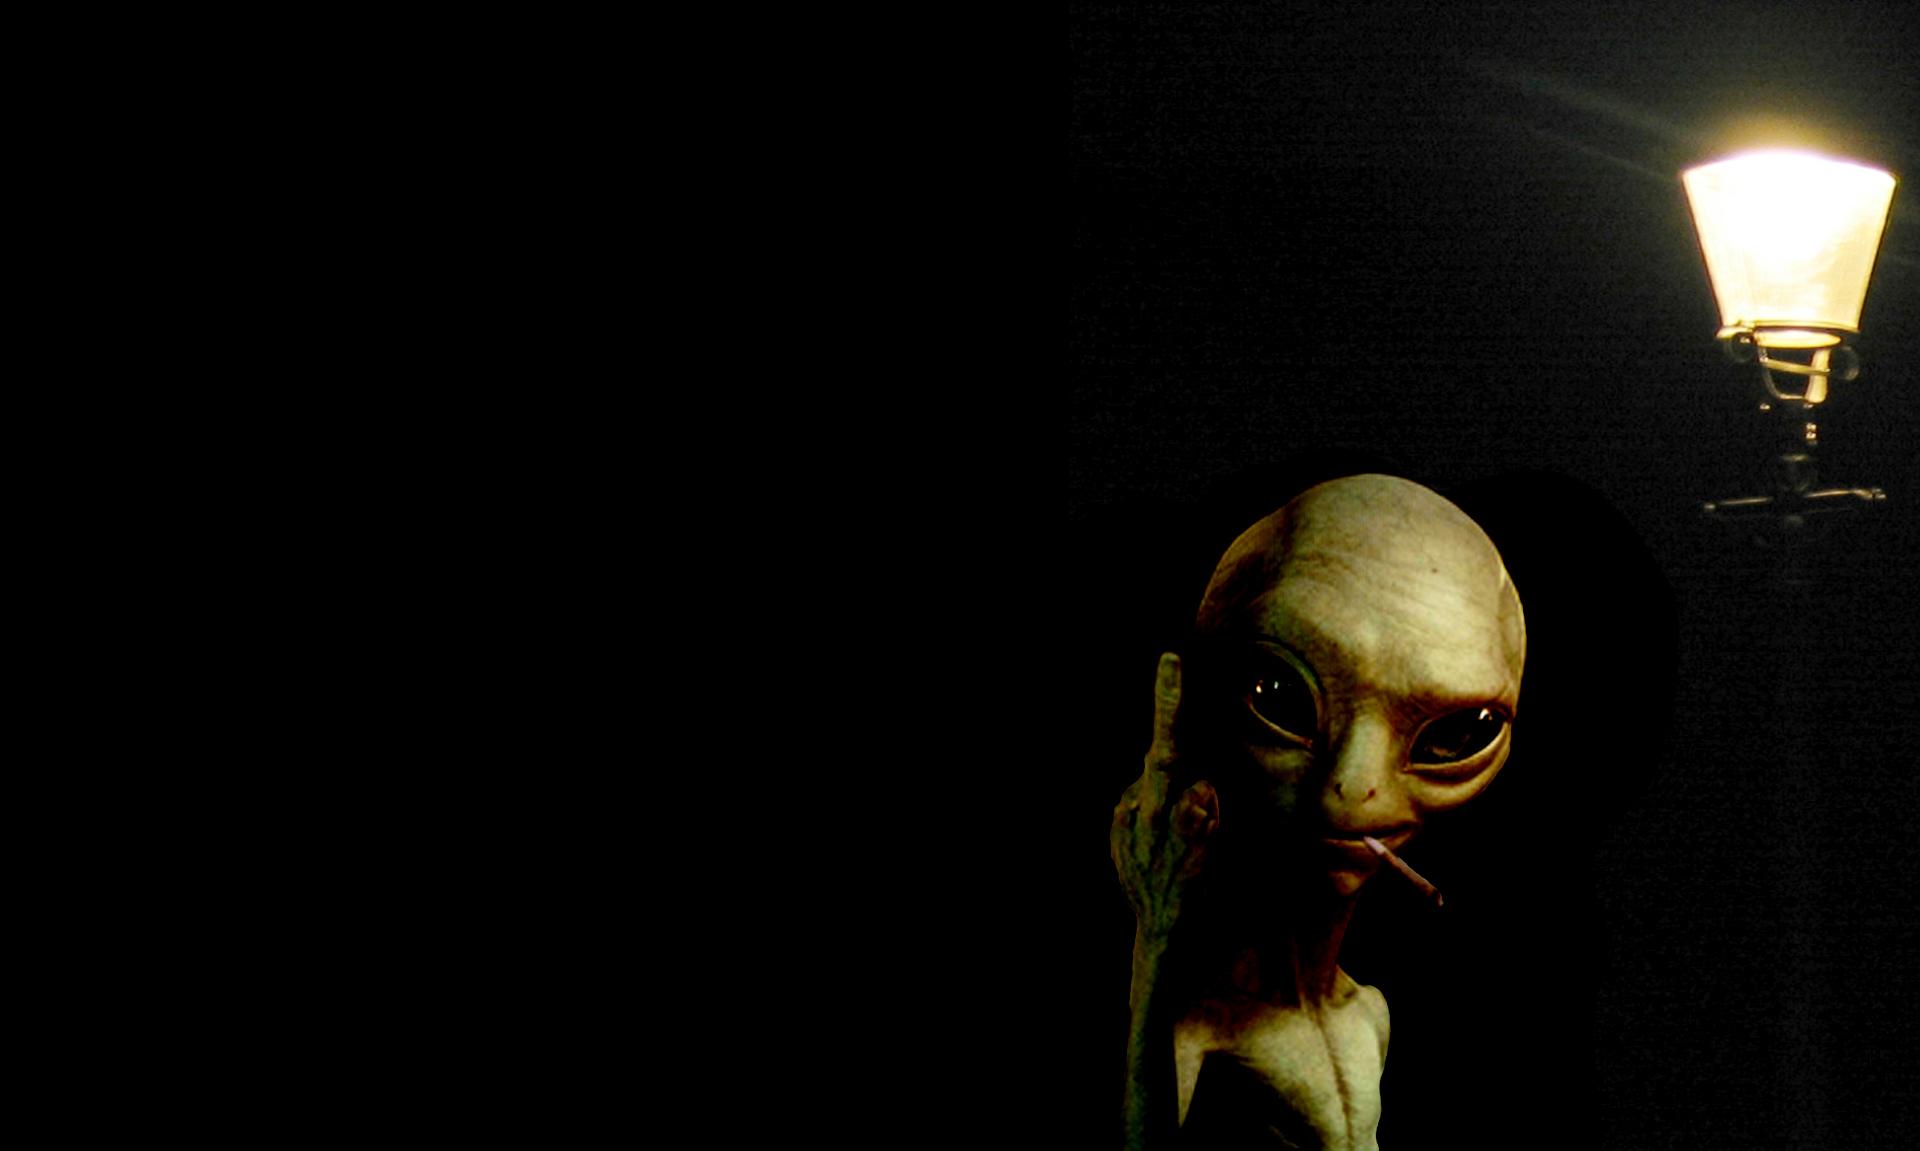 alien hd iphone wallpapers - photo #43